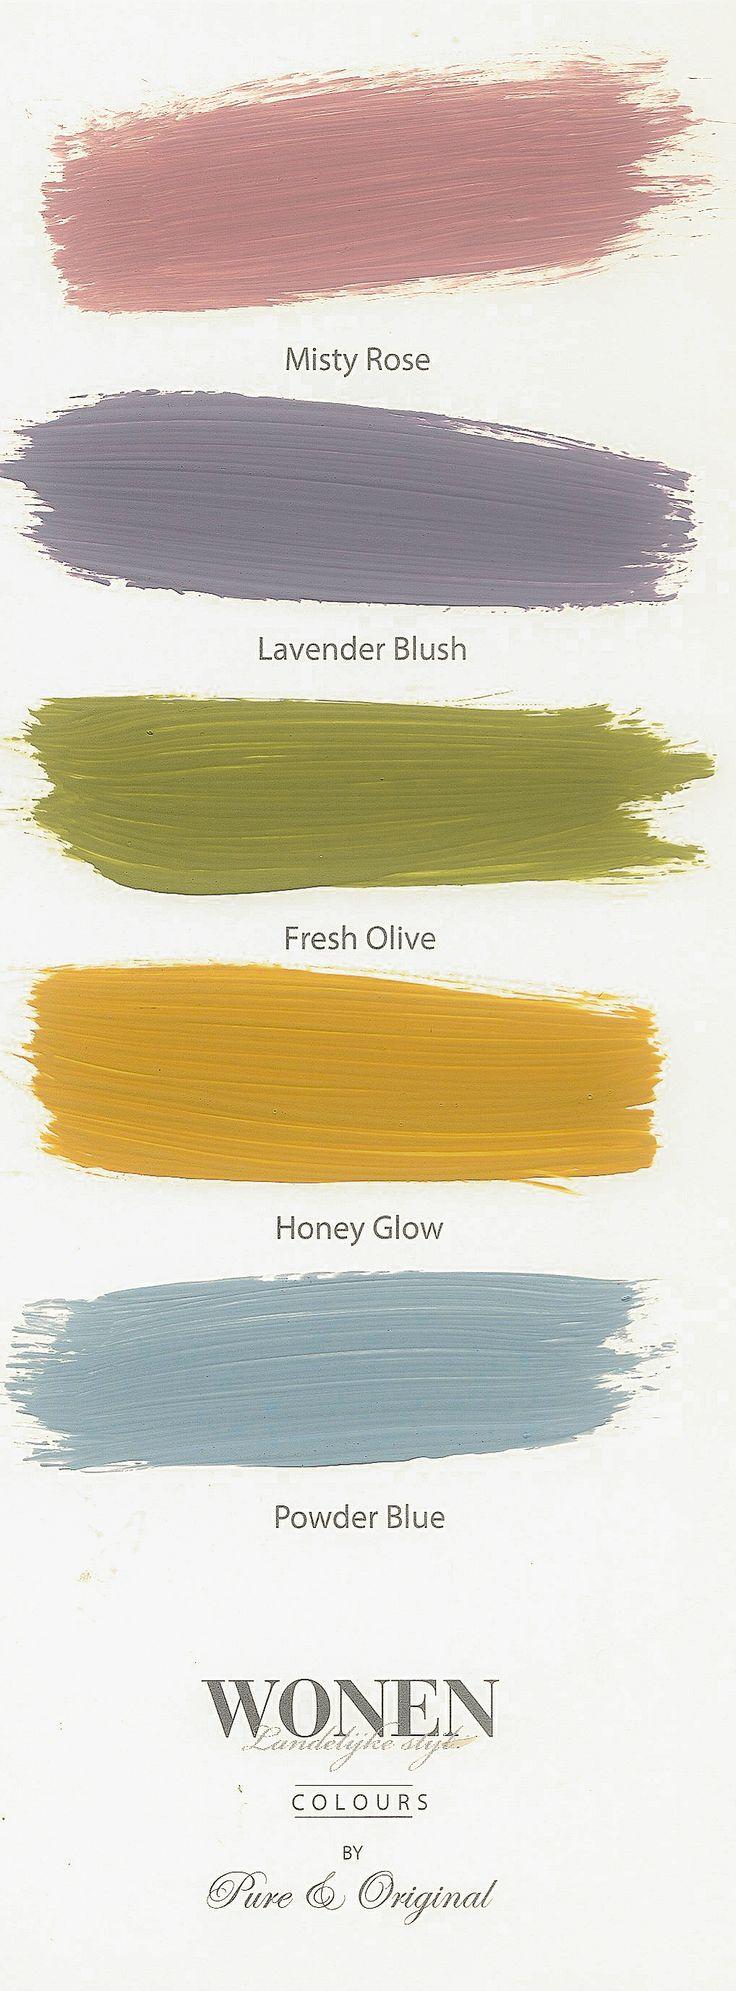 5 new colors Wonen Landelijke Stijl by Pure & Original. leverbaar in Kalkverf, Krijtverf, Marrakech Wall en lak op waterbasis.